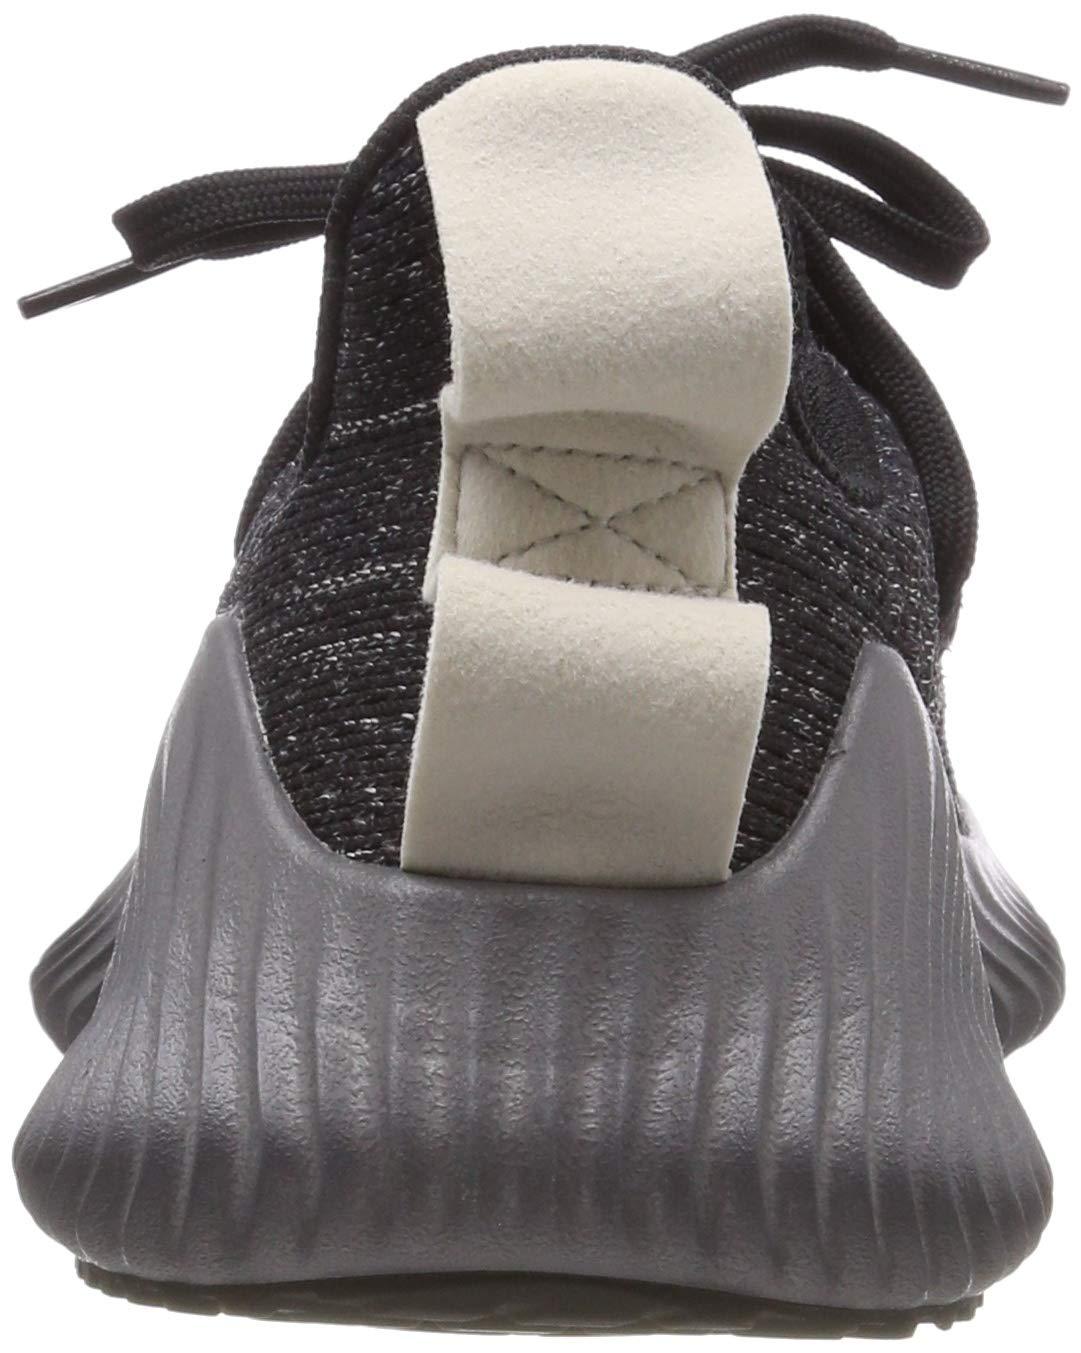 Adidas Alphabounce Trainer W 2 spesavip